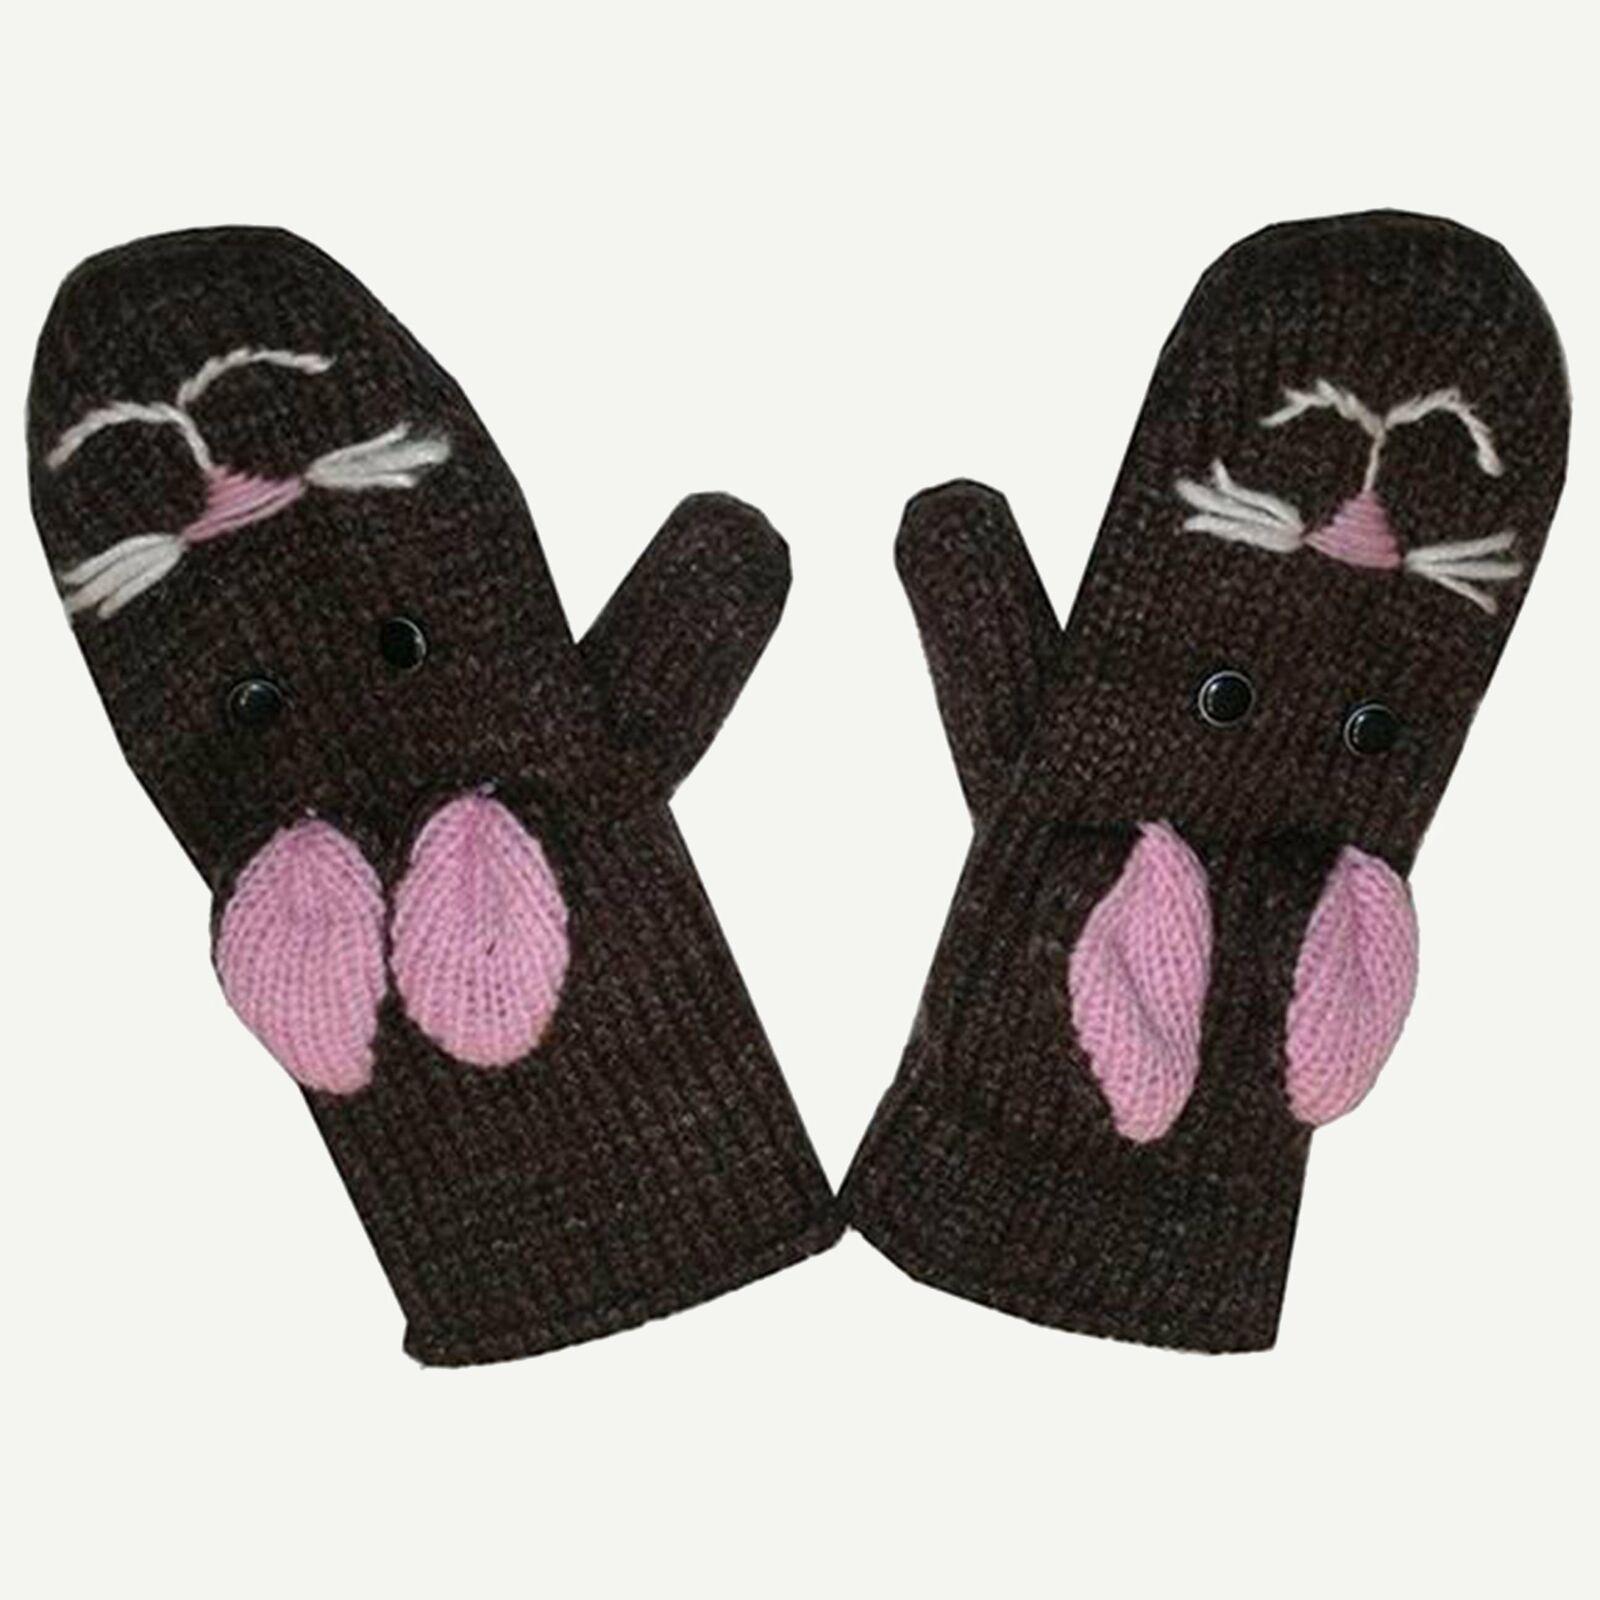 Assorted Highland Soft Wool Fleece Lined Outdoor Animal Mitten Glove